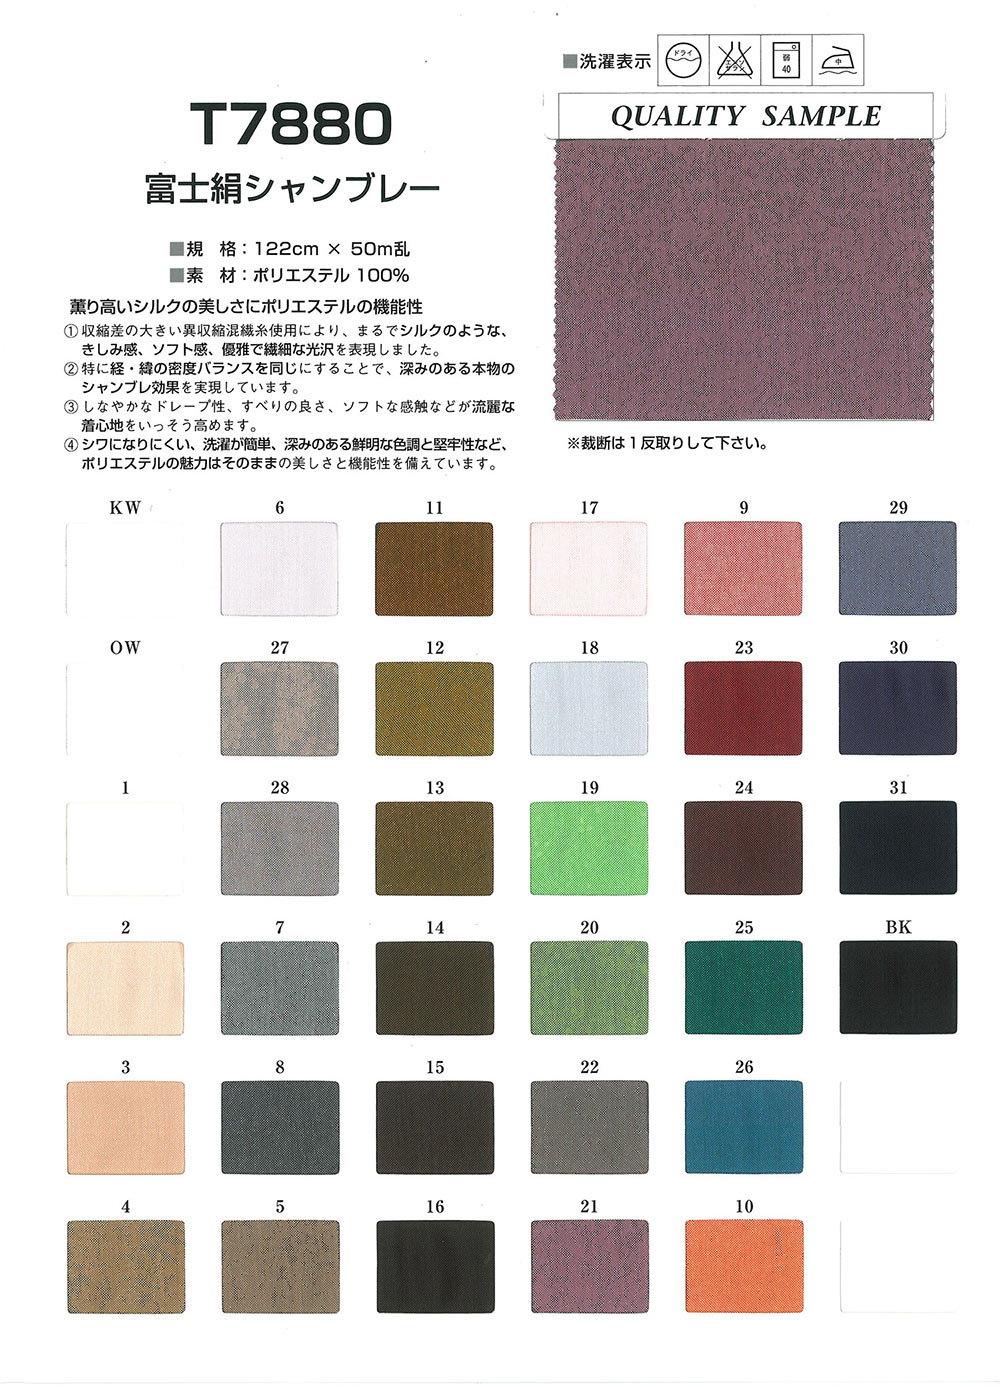 T7880 富士絹シャンブレー[裏地] 東レ/オークラ商事 - ApparelX アパレル資材卸通販